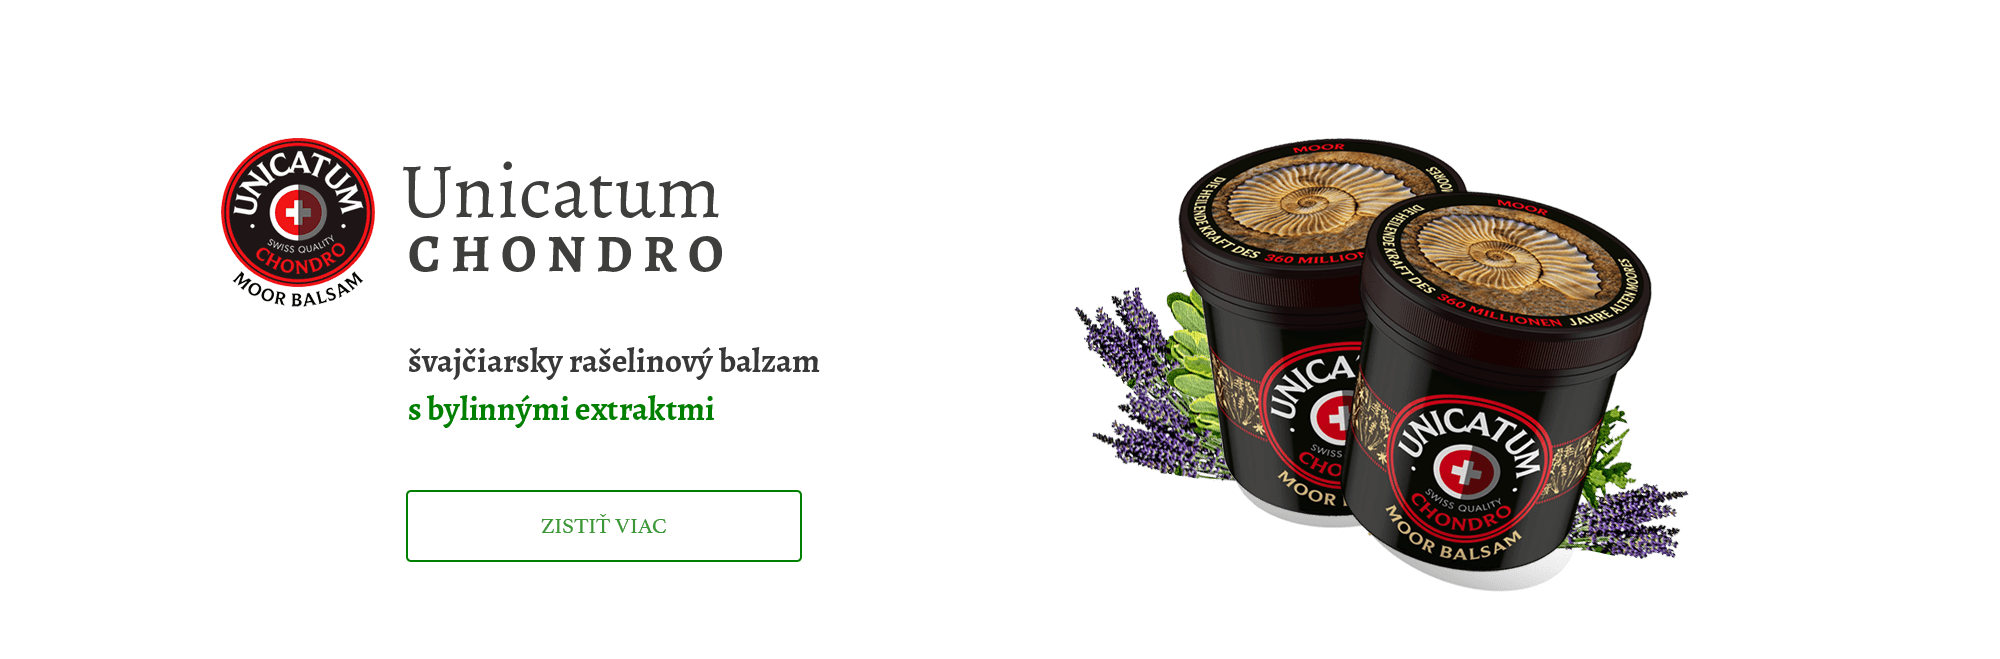 Banner - Unicatum Chondro - 250 ml